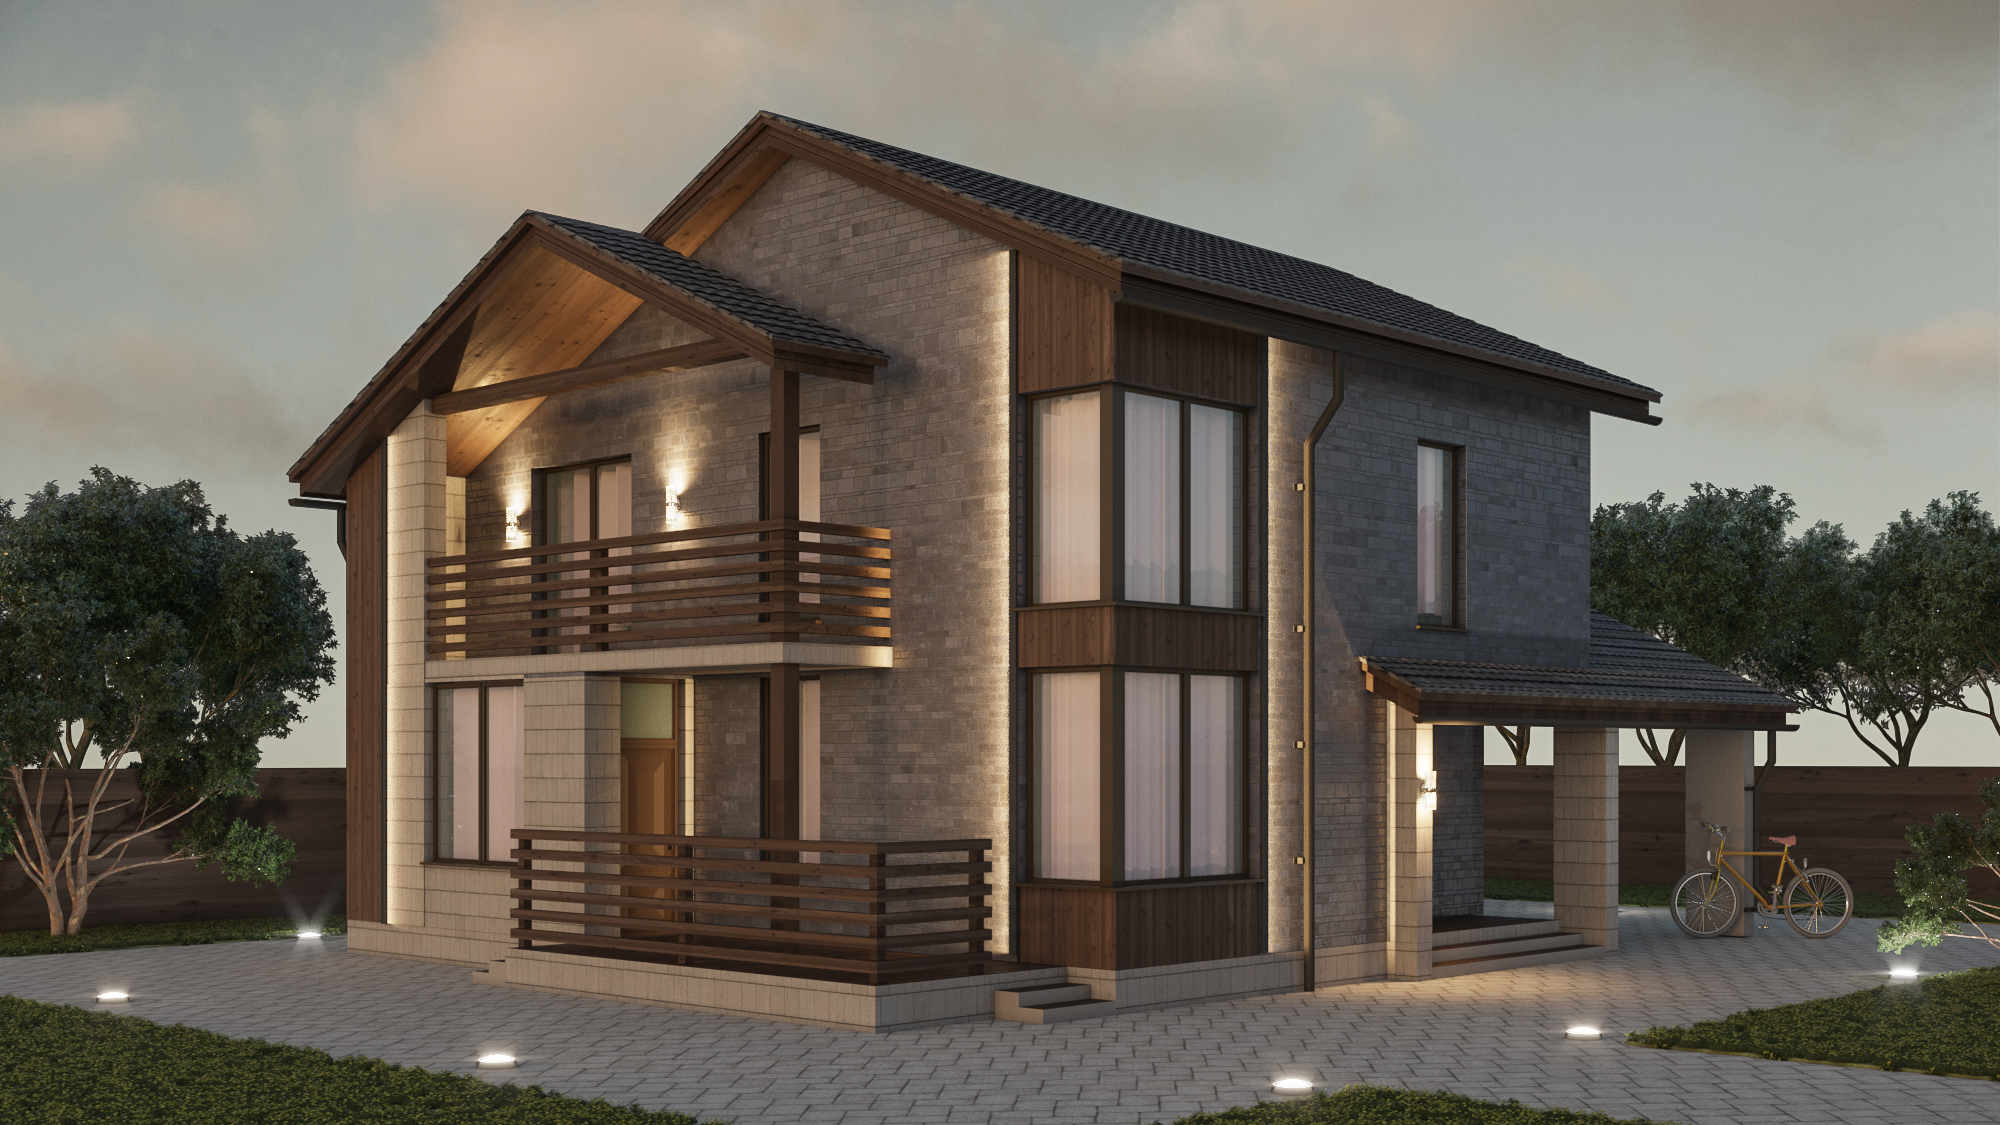 2 meter pvc rainway regenrinnensystem regenwasser regenrinne dachrinne ebay. Black Bedroom Furniture Sets. Home Design Ideas